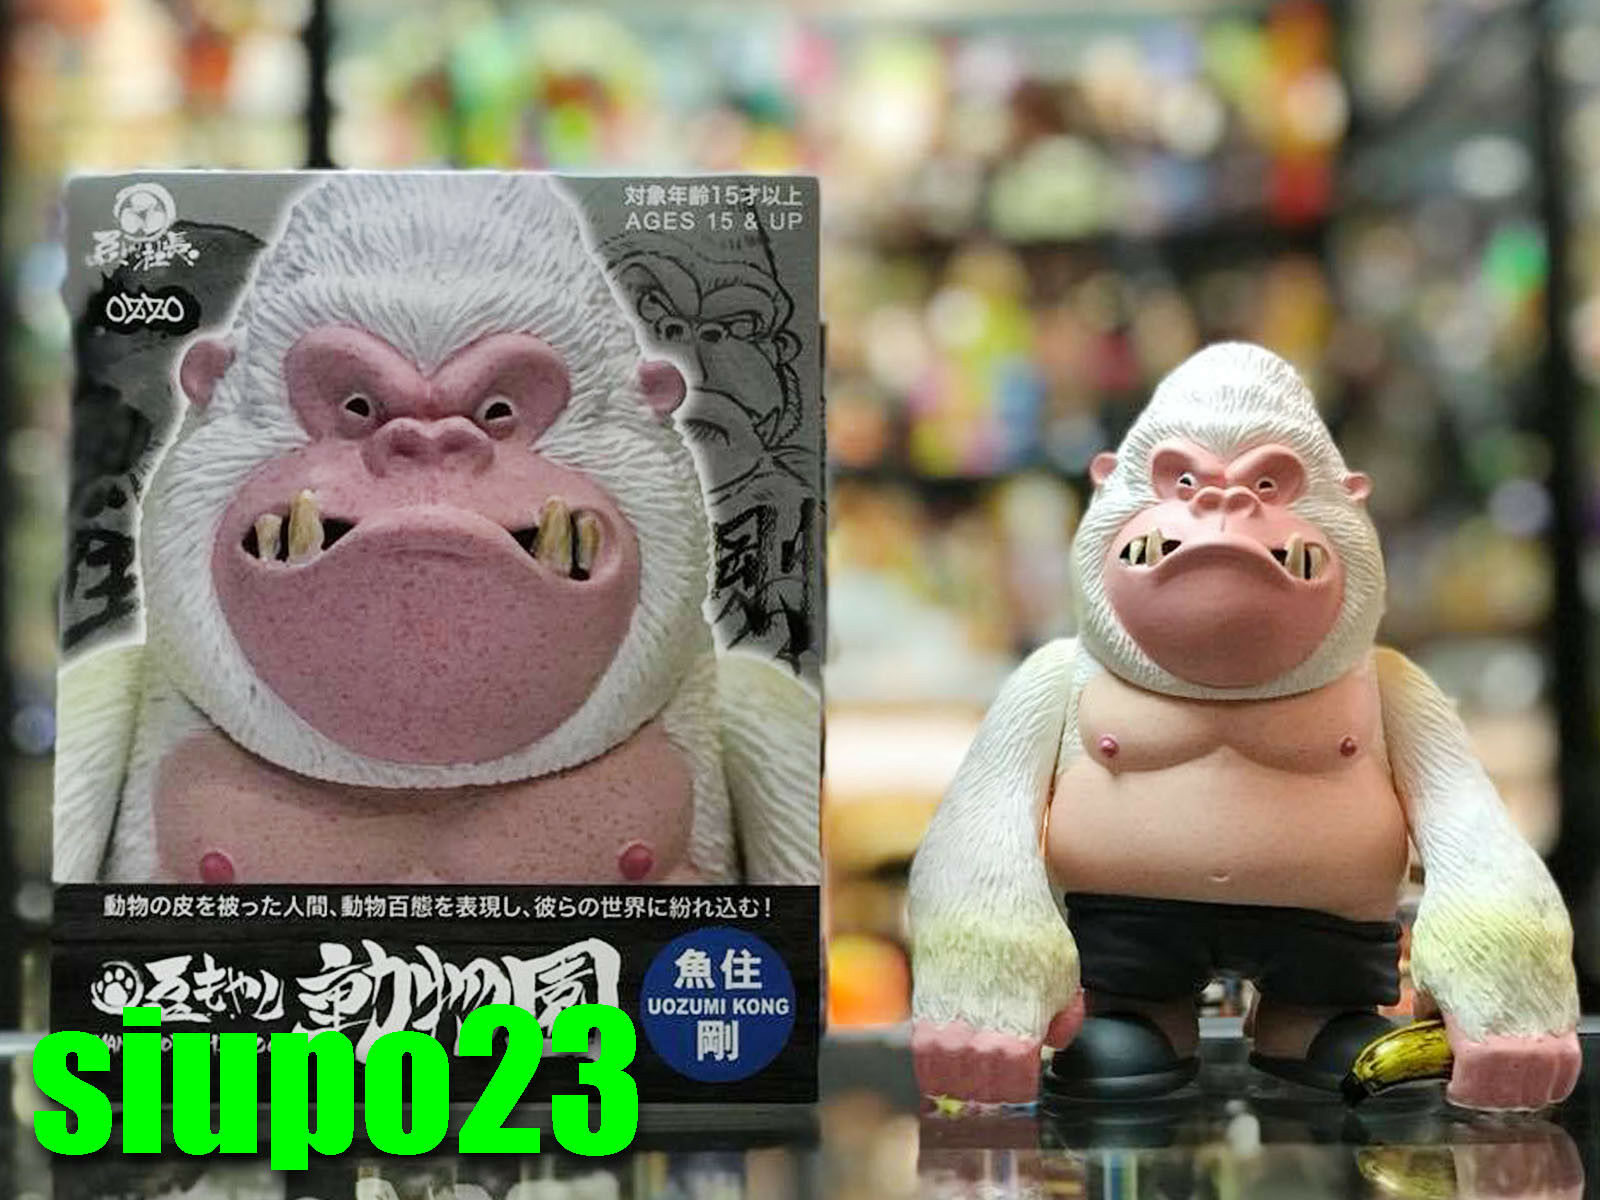 Mame Moyashi  Mame Moyashi Zoo x OZZO Vinyl Figur Uozumi Kong